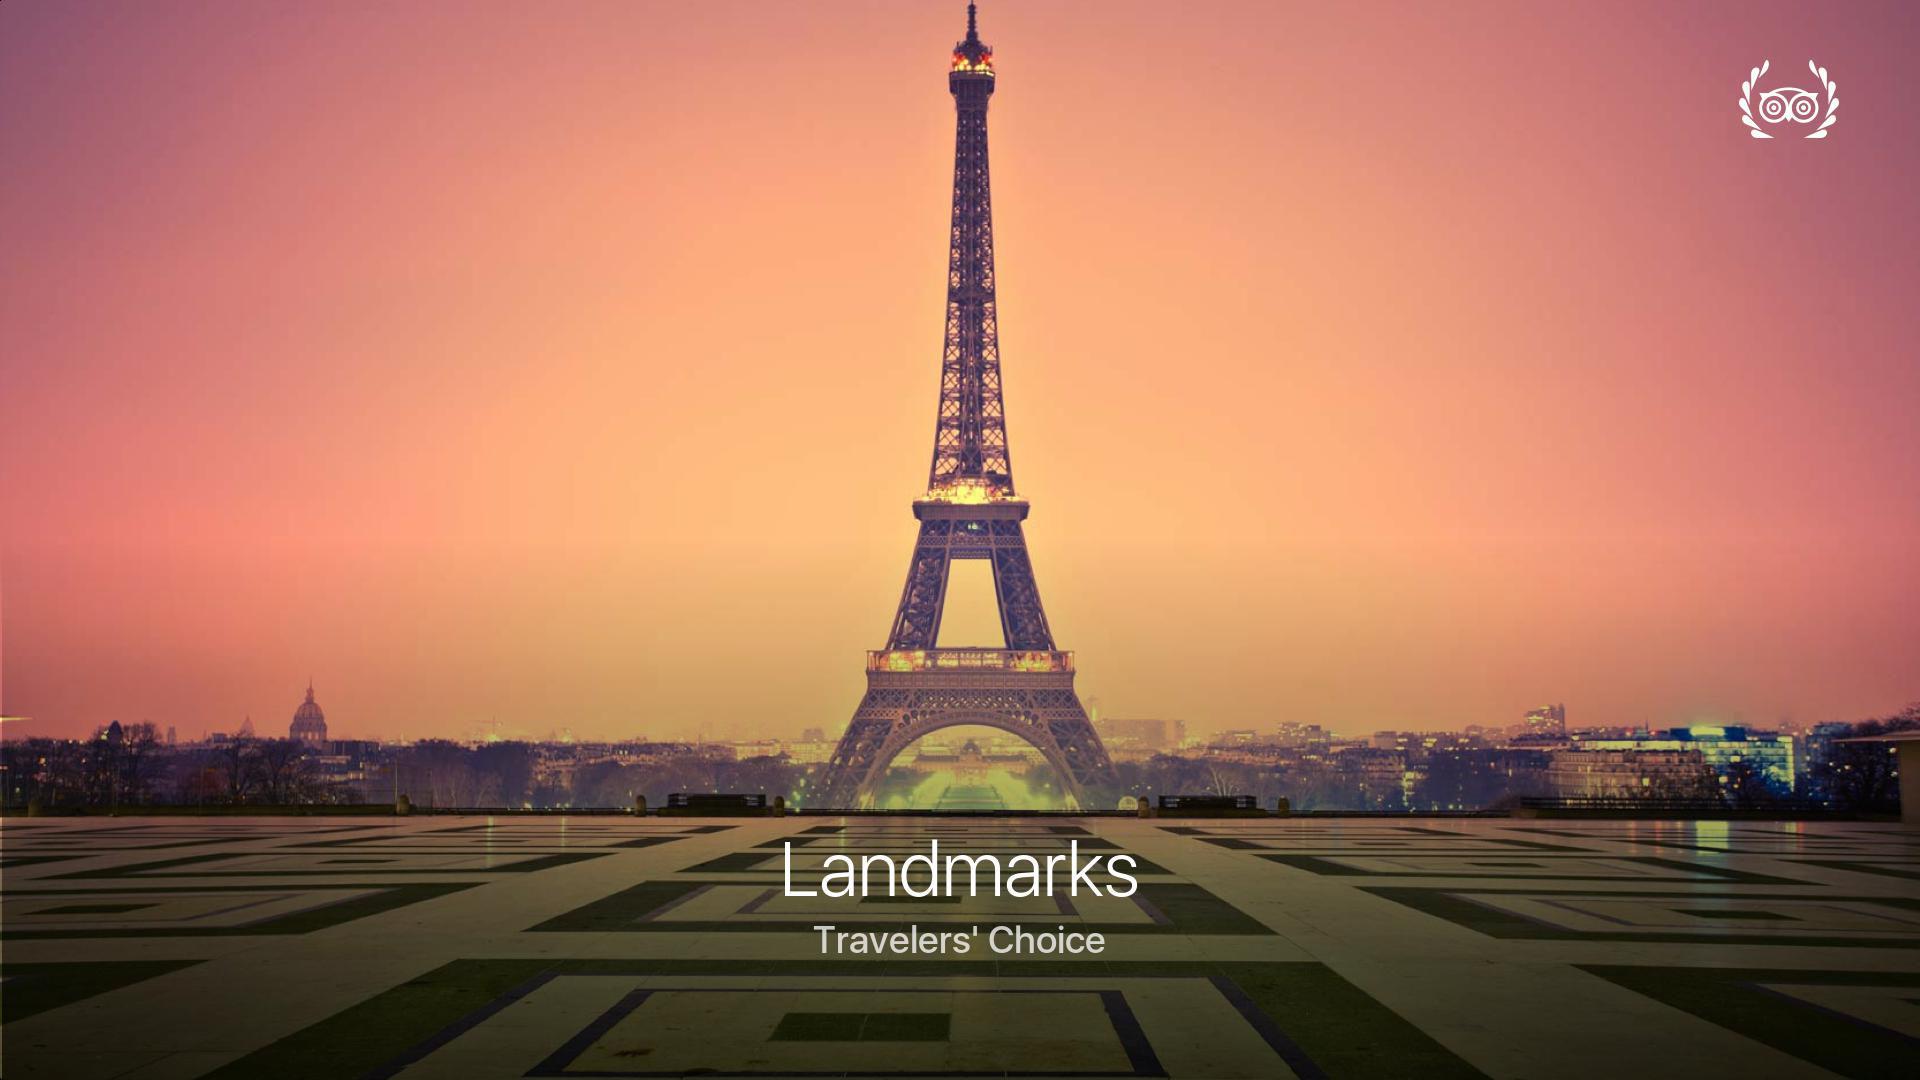 Tripadvisor Hotels & Vacation screenshot 16